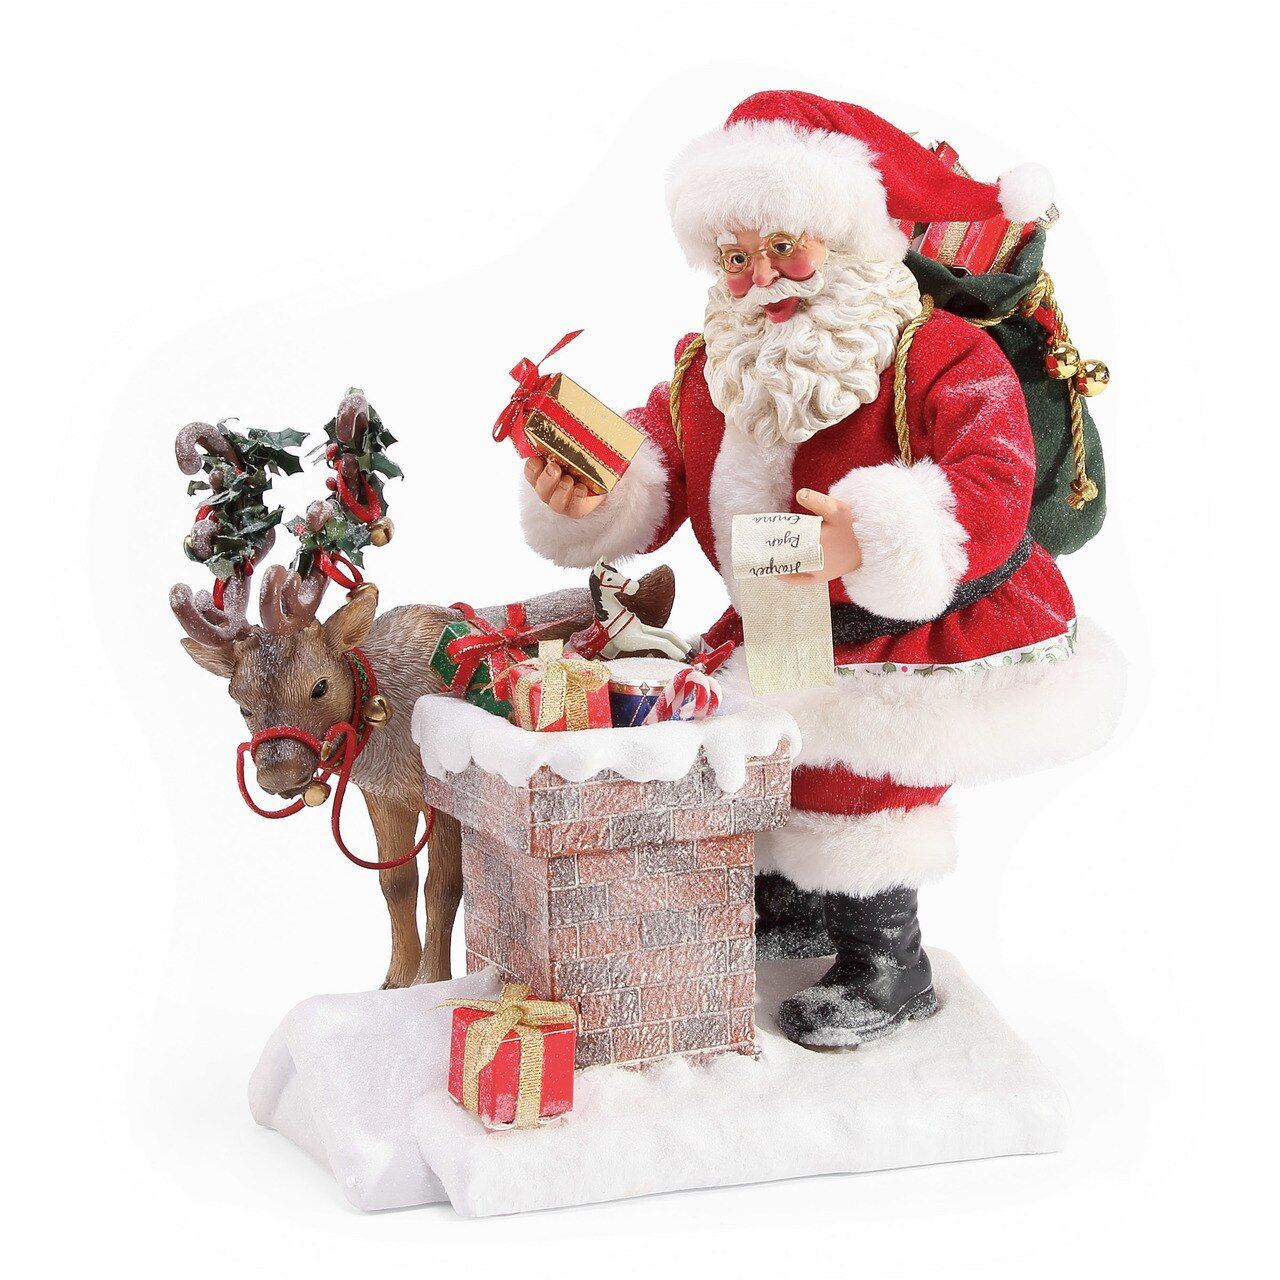 Department 56 Possible Dreams Rooftop Magic Santa Figure 6003843 Reindeer Christmas Present Magic Santa Unique Christmas Decorations